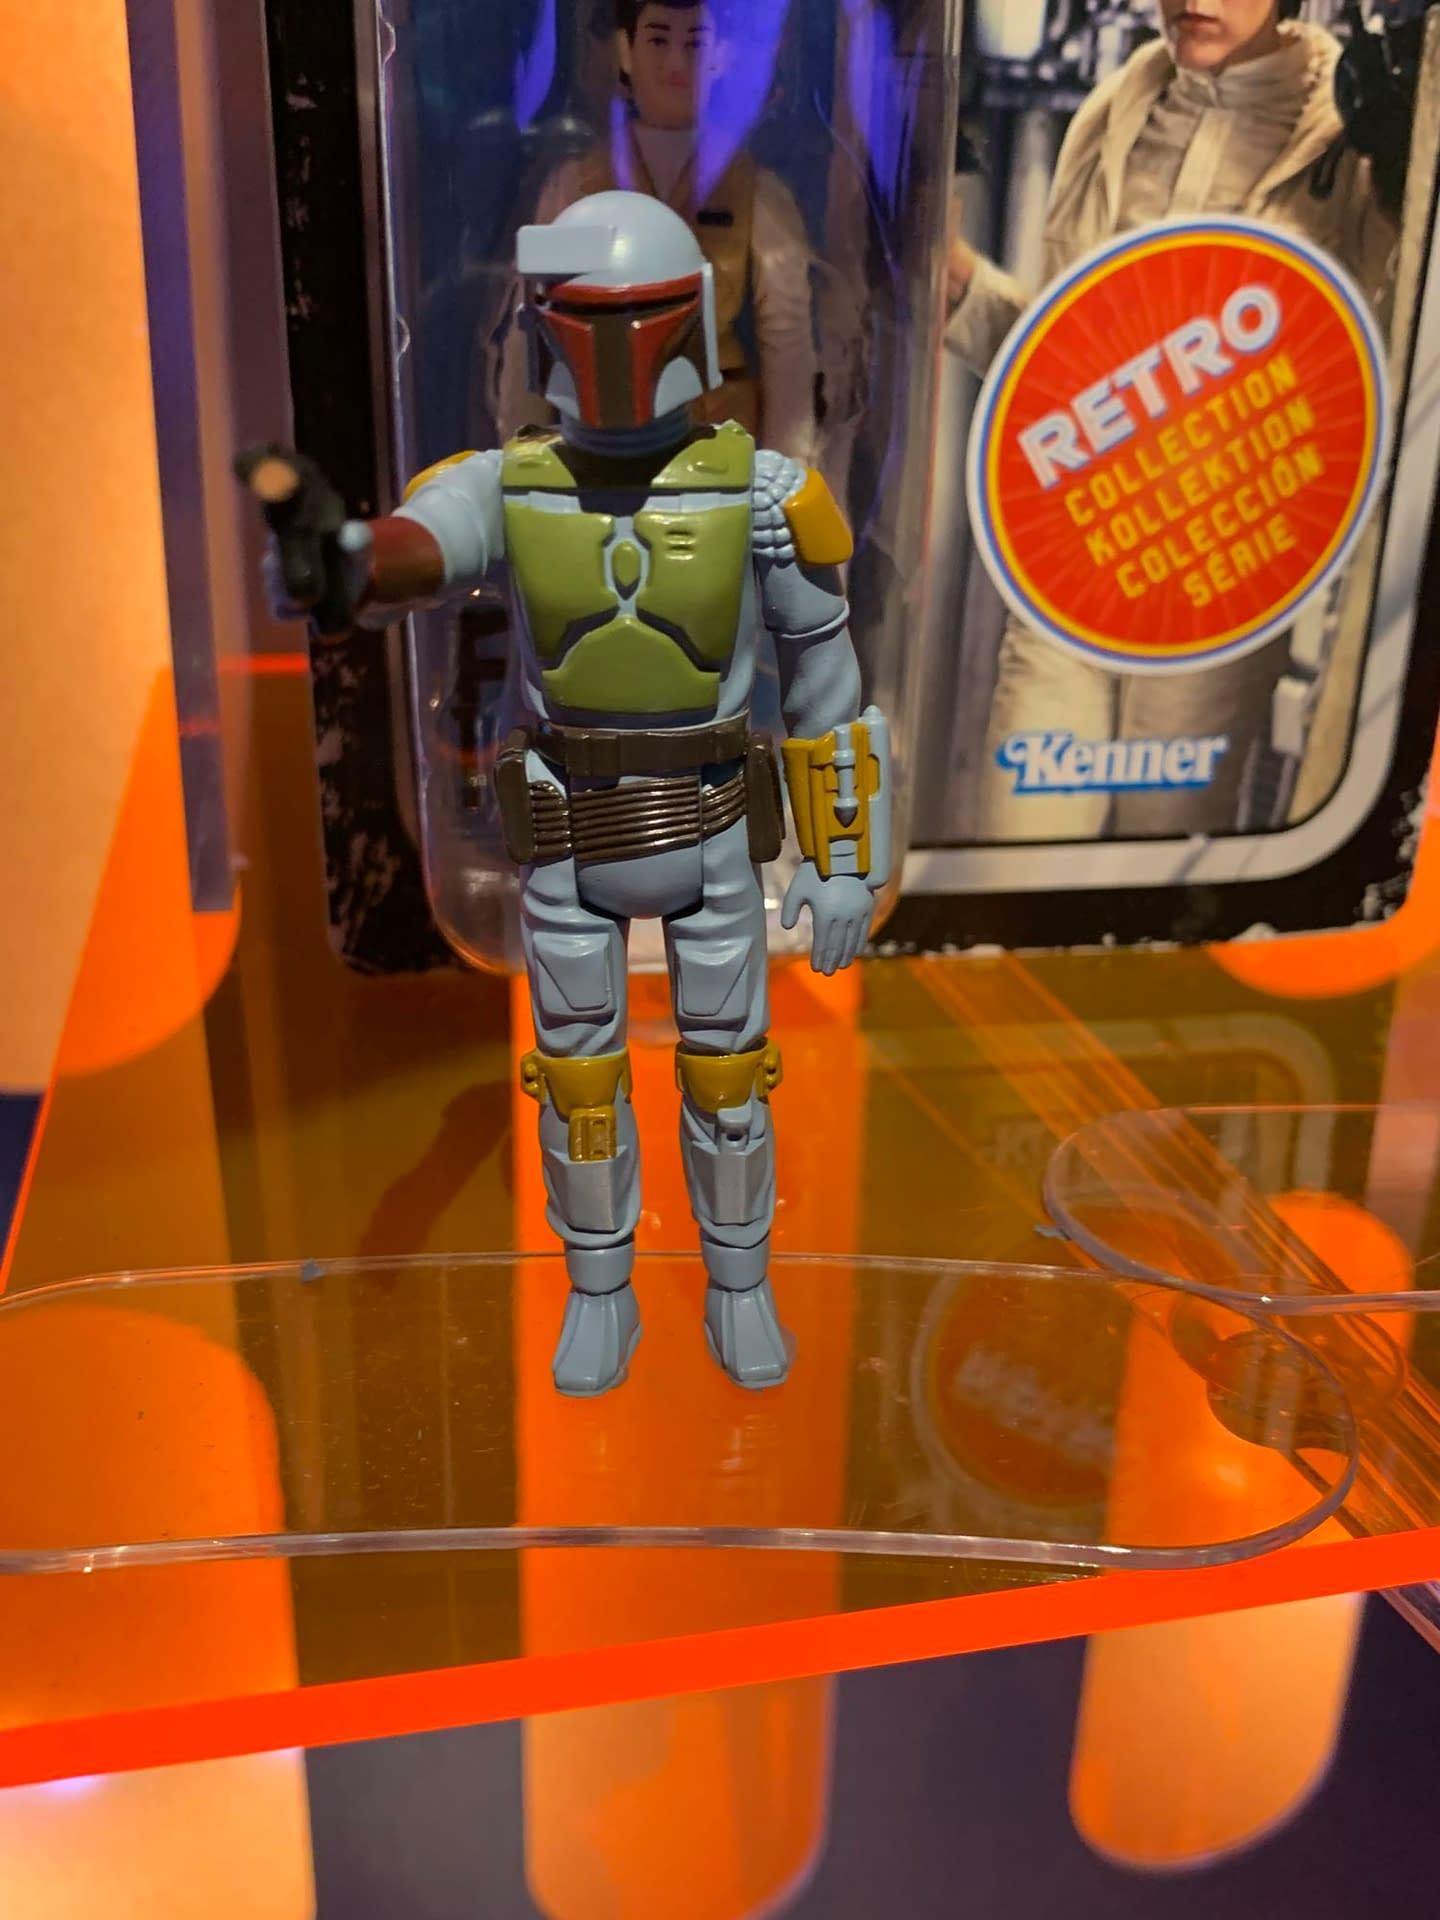 Hasbro New York Toy Fair 2020 - 38 Photos of Star Wars